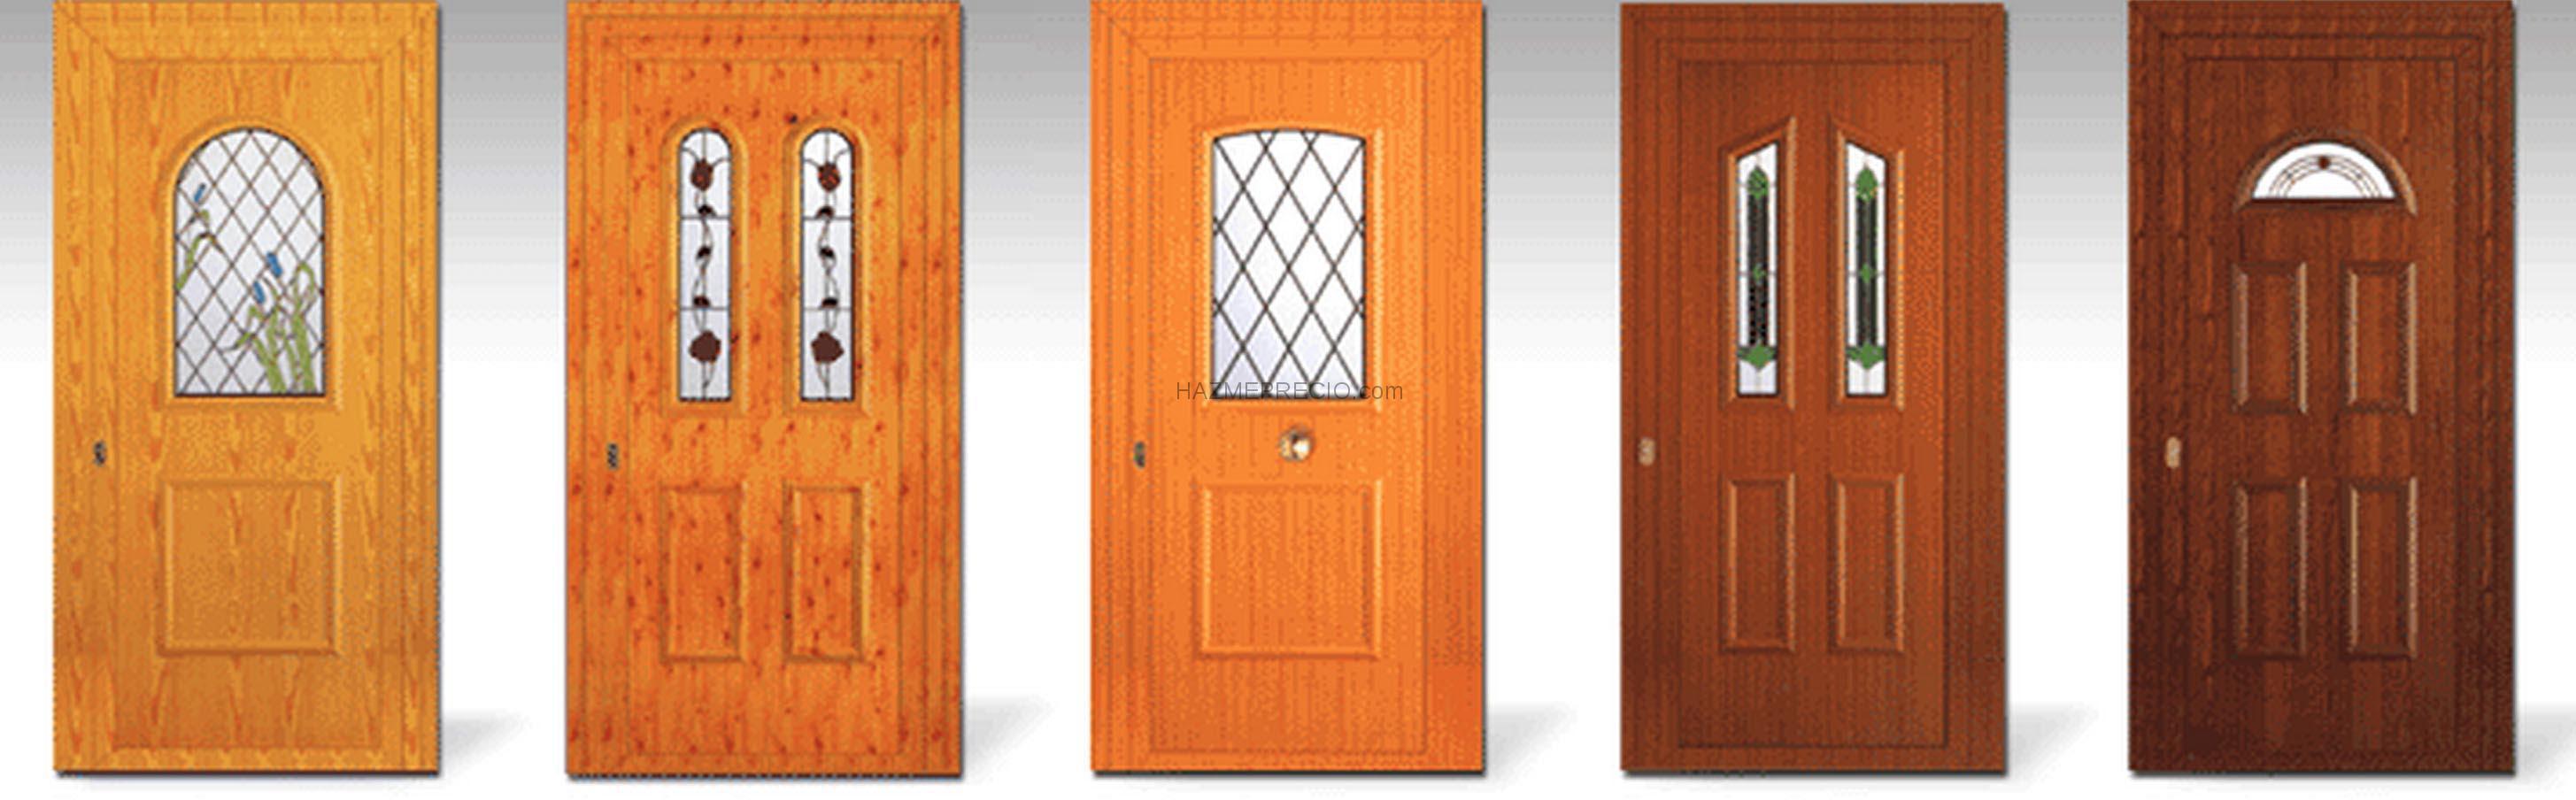 Empresas de carpinteria de aluminio en valencia - Puertas de aluminio color madera ...